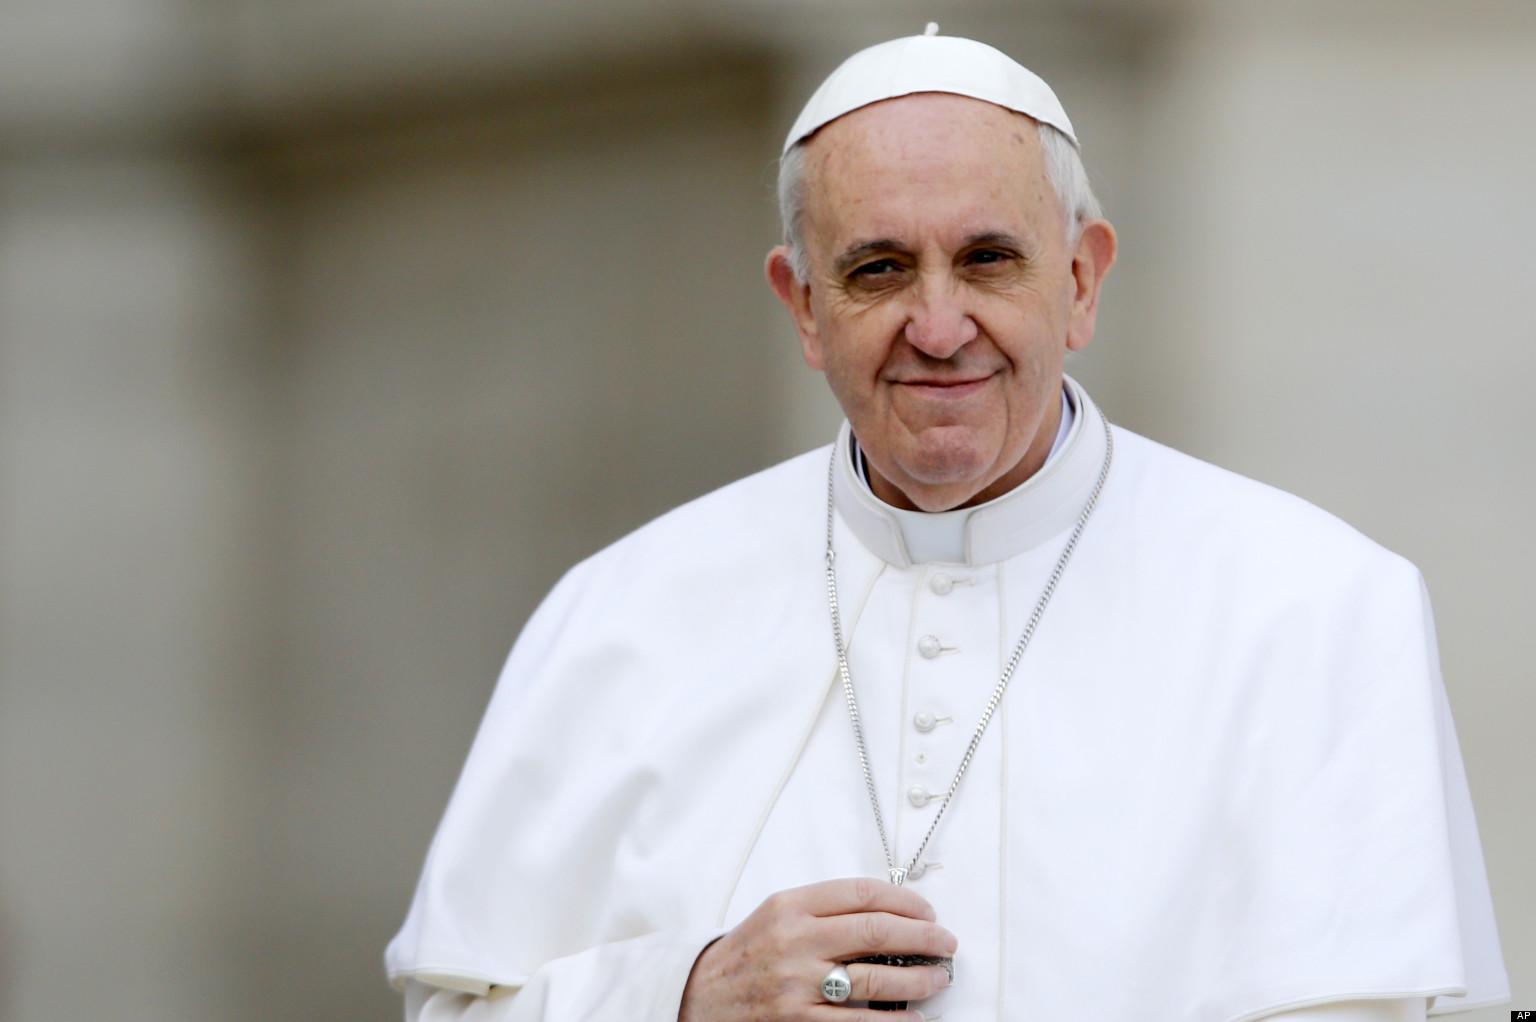 Un papa latinoamericano, el impulso final para beatificar a Romero